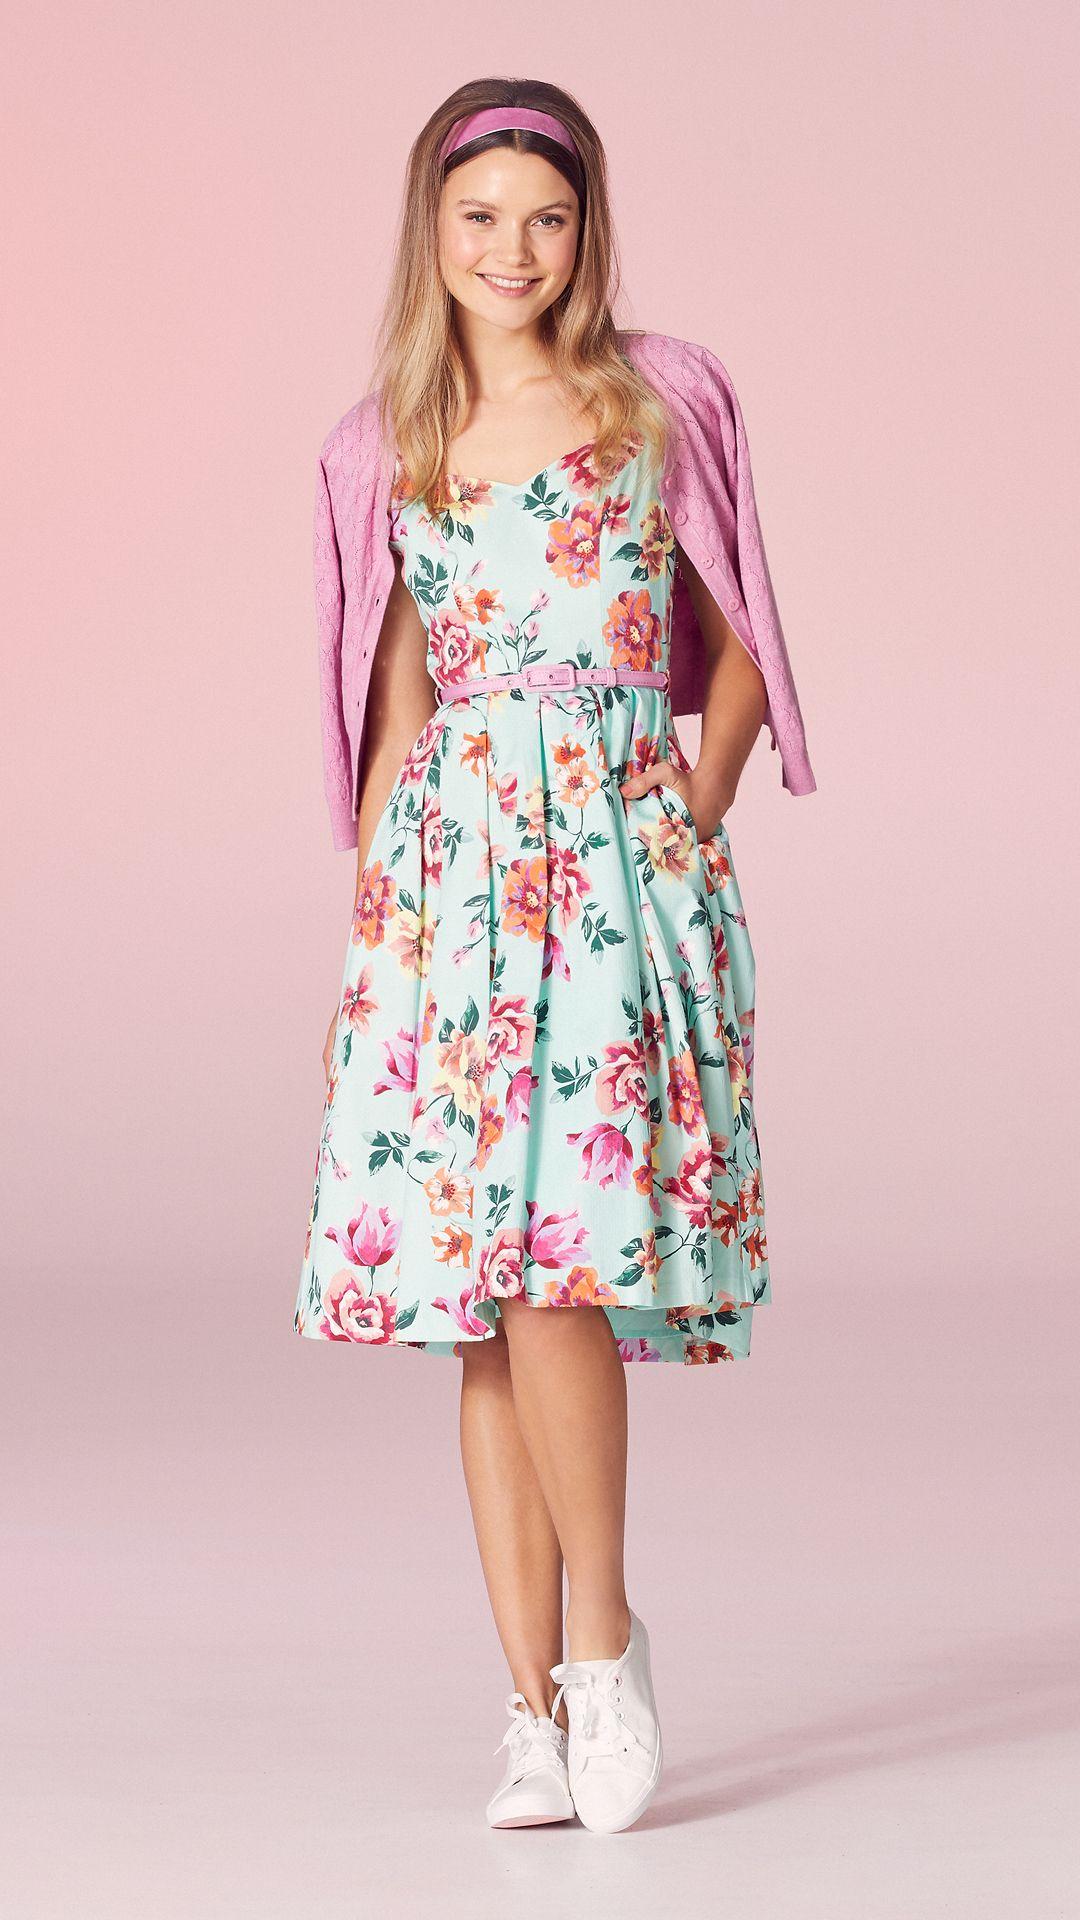 Live Your Dressed Life Dresses Art Dress Australia Clothes